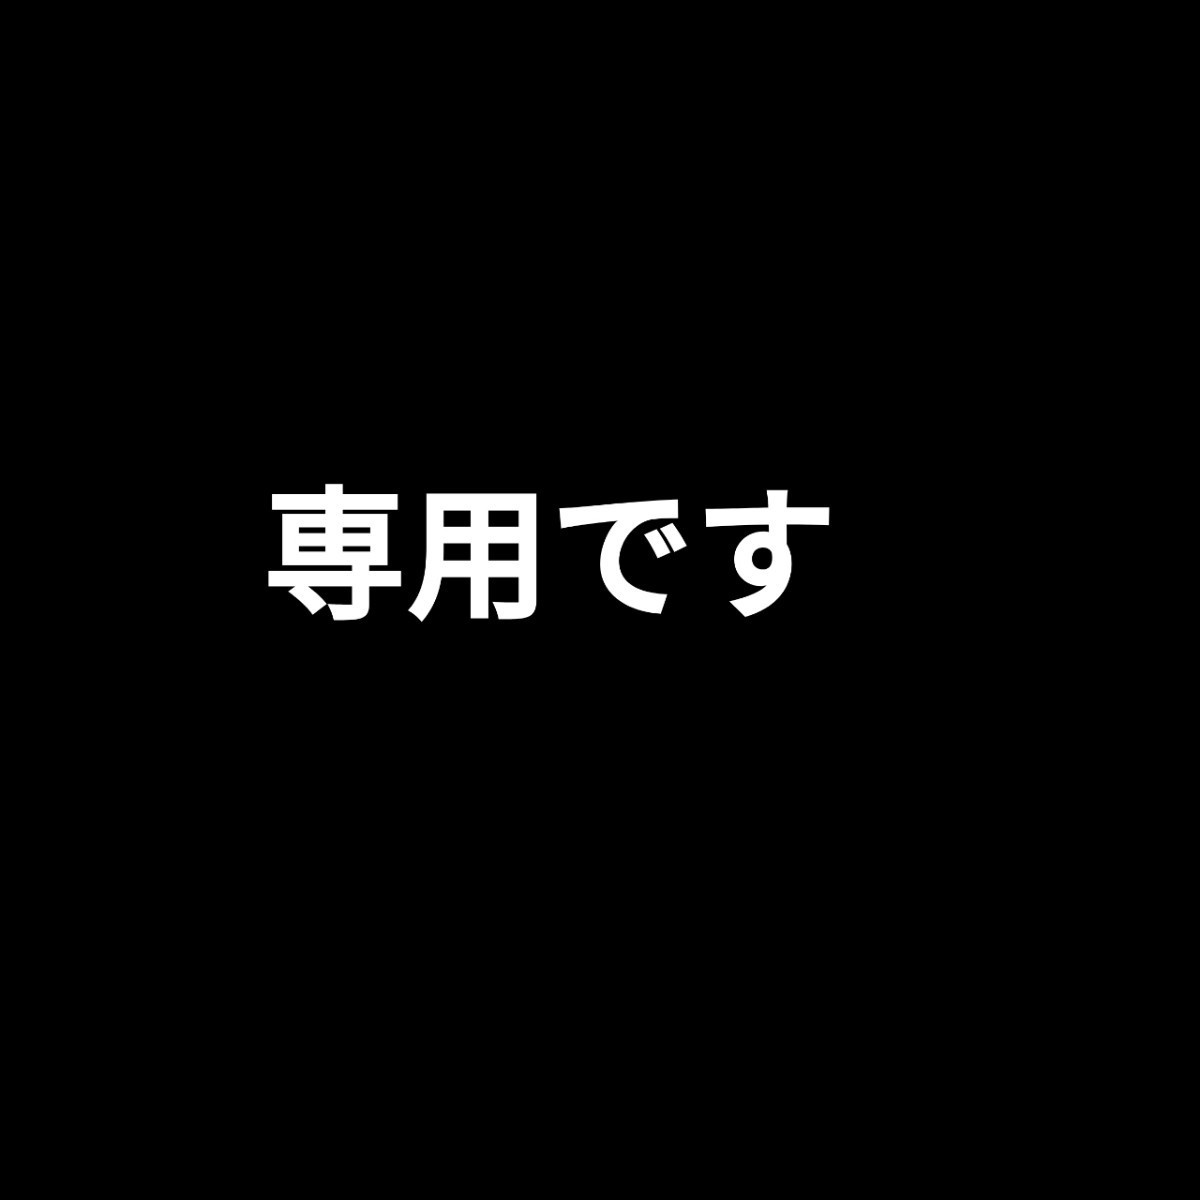 kurisu様 専用